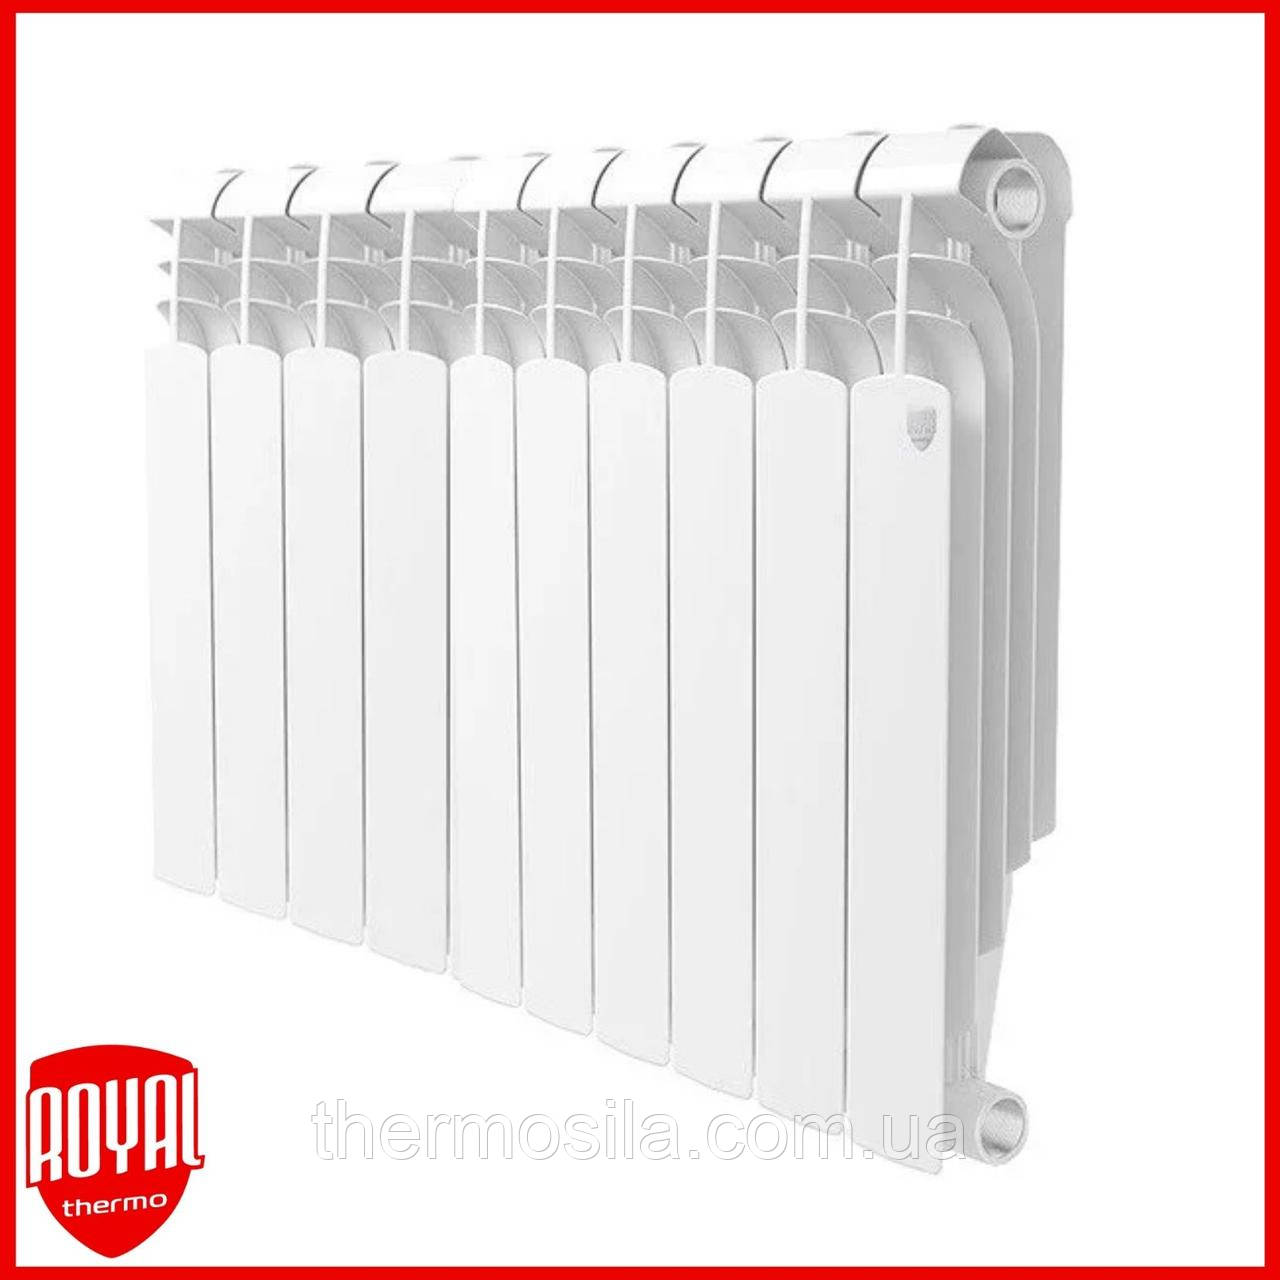 Радиатор биметаллический Royal Thermo Violento BM 500 - 10 секций